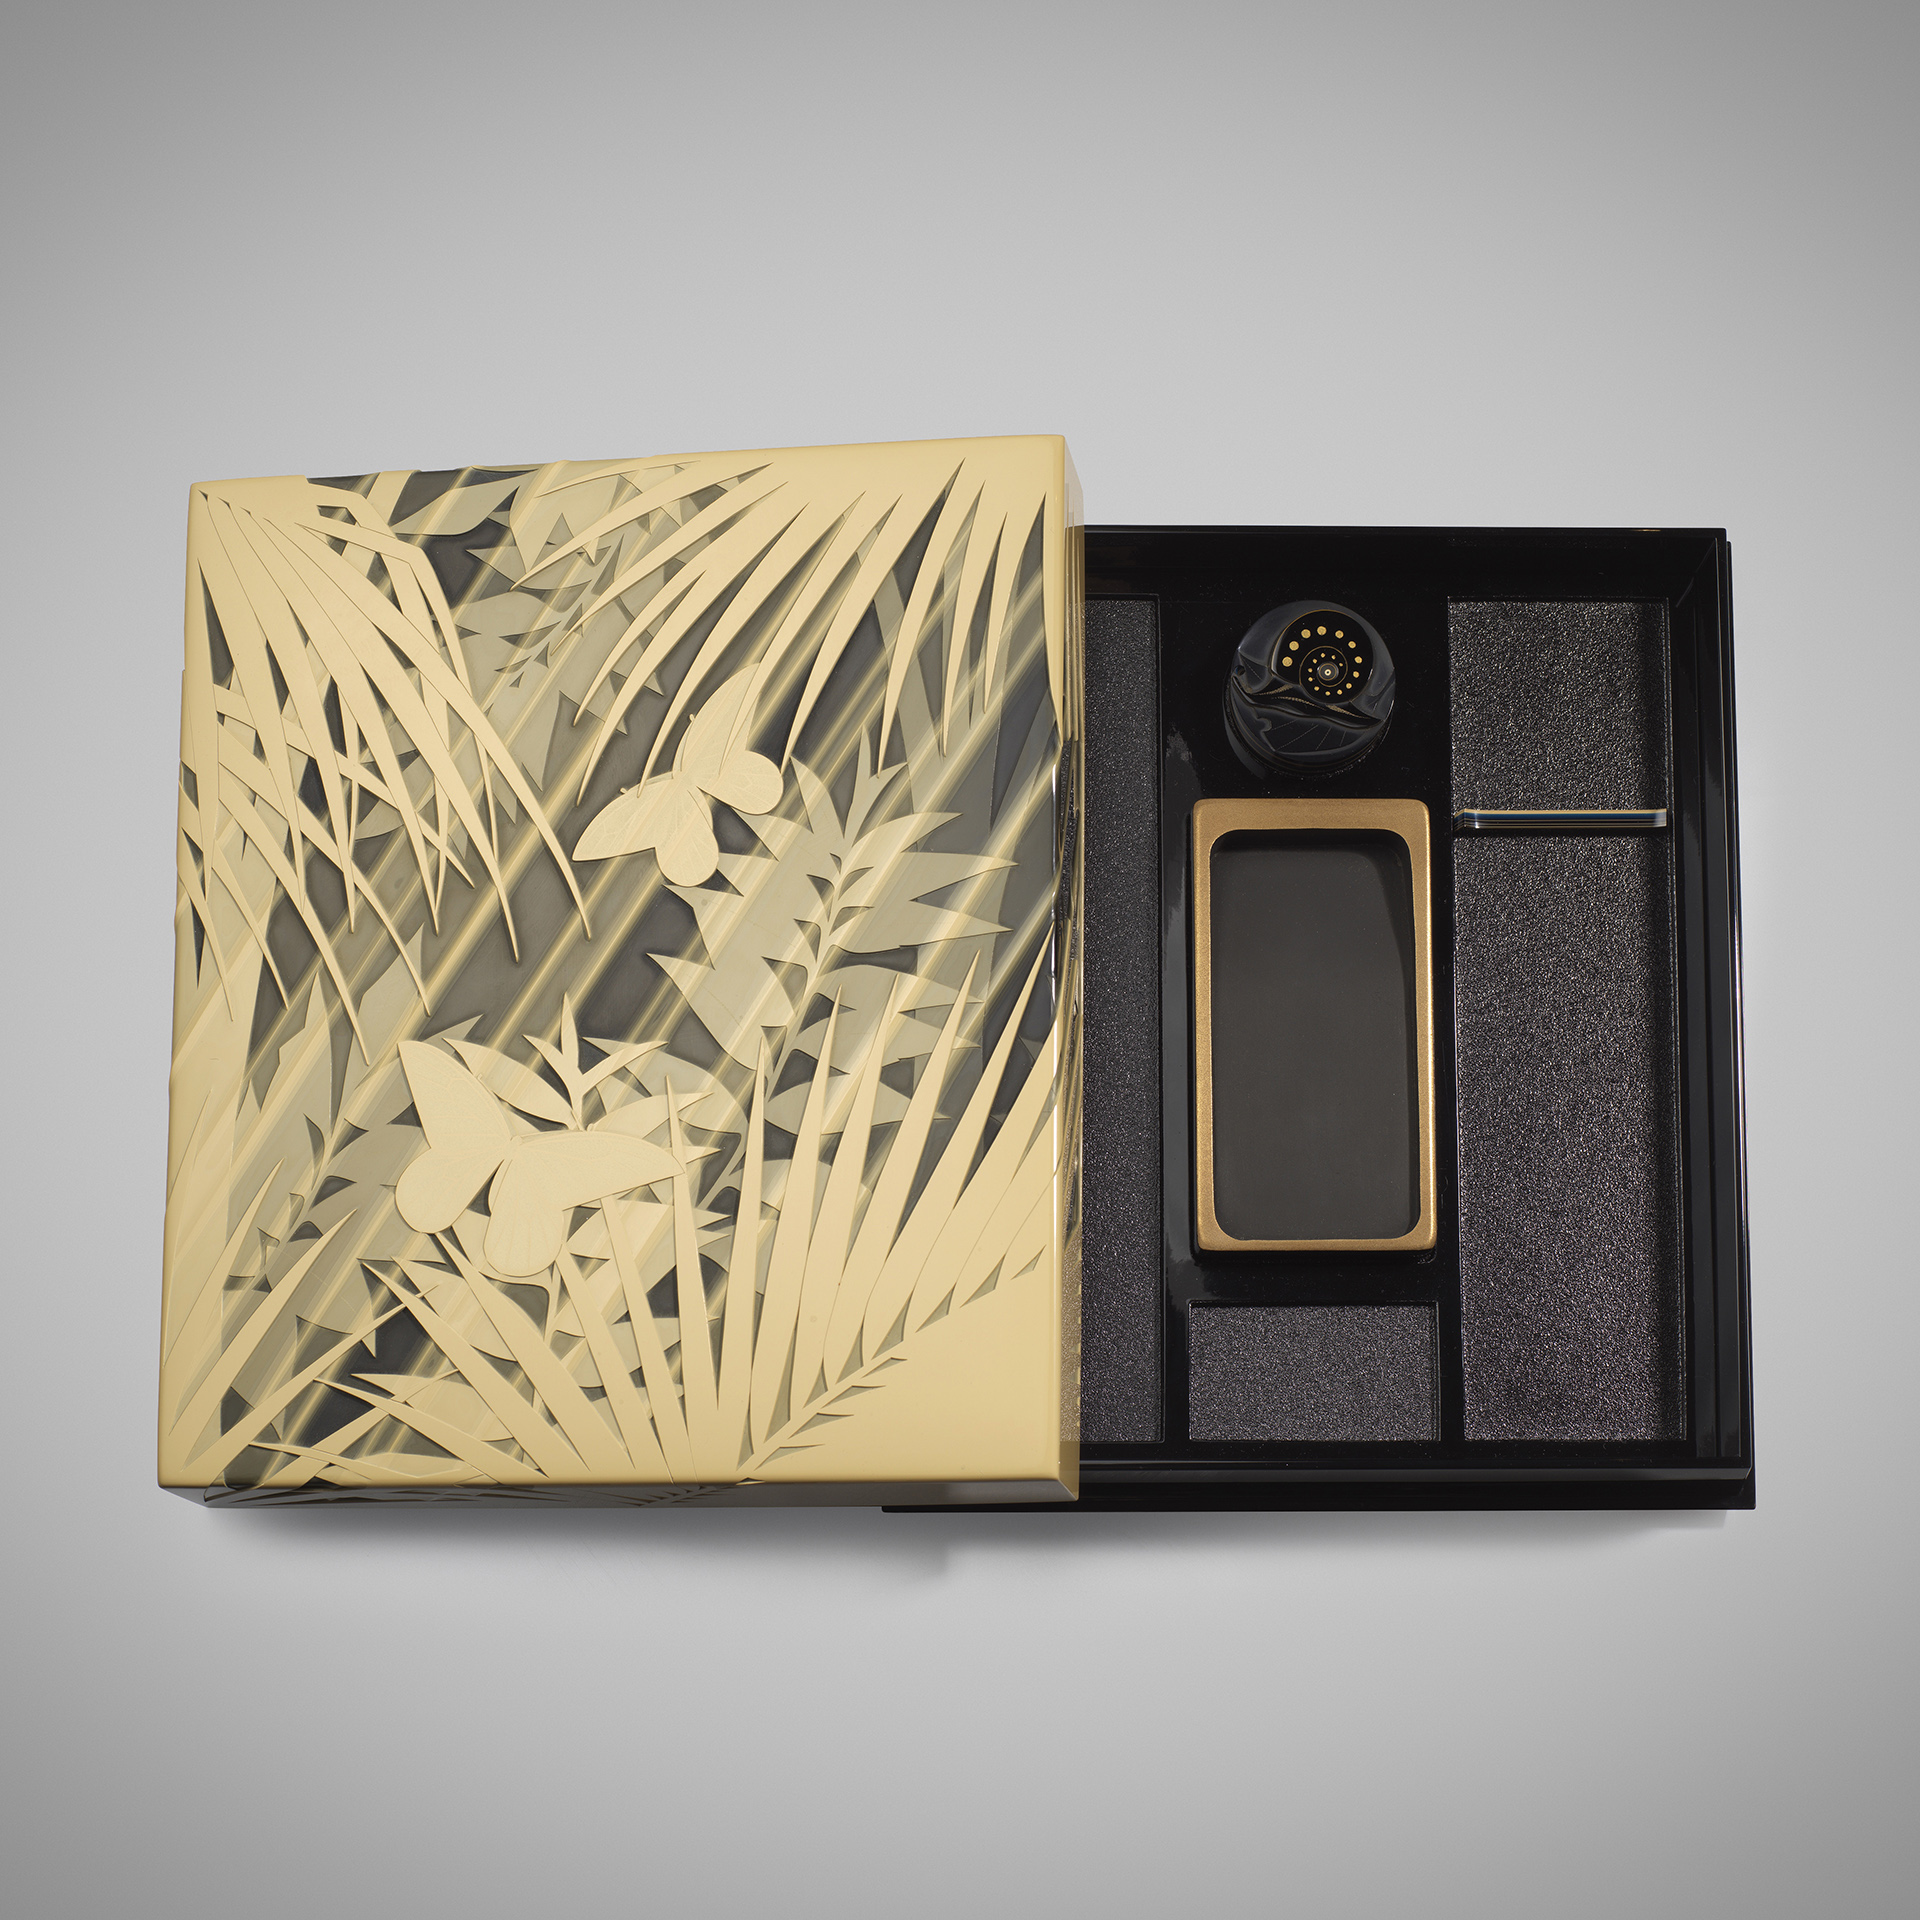 Matsubara Hiroaki (b. 1967) A contemporary lacquer writing box carved with the design of butterflies in the morning sun. Heisei era, 2008. 5 x 32.5 x 26.5 cm